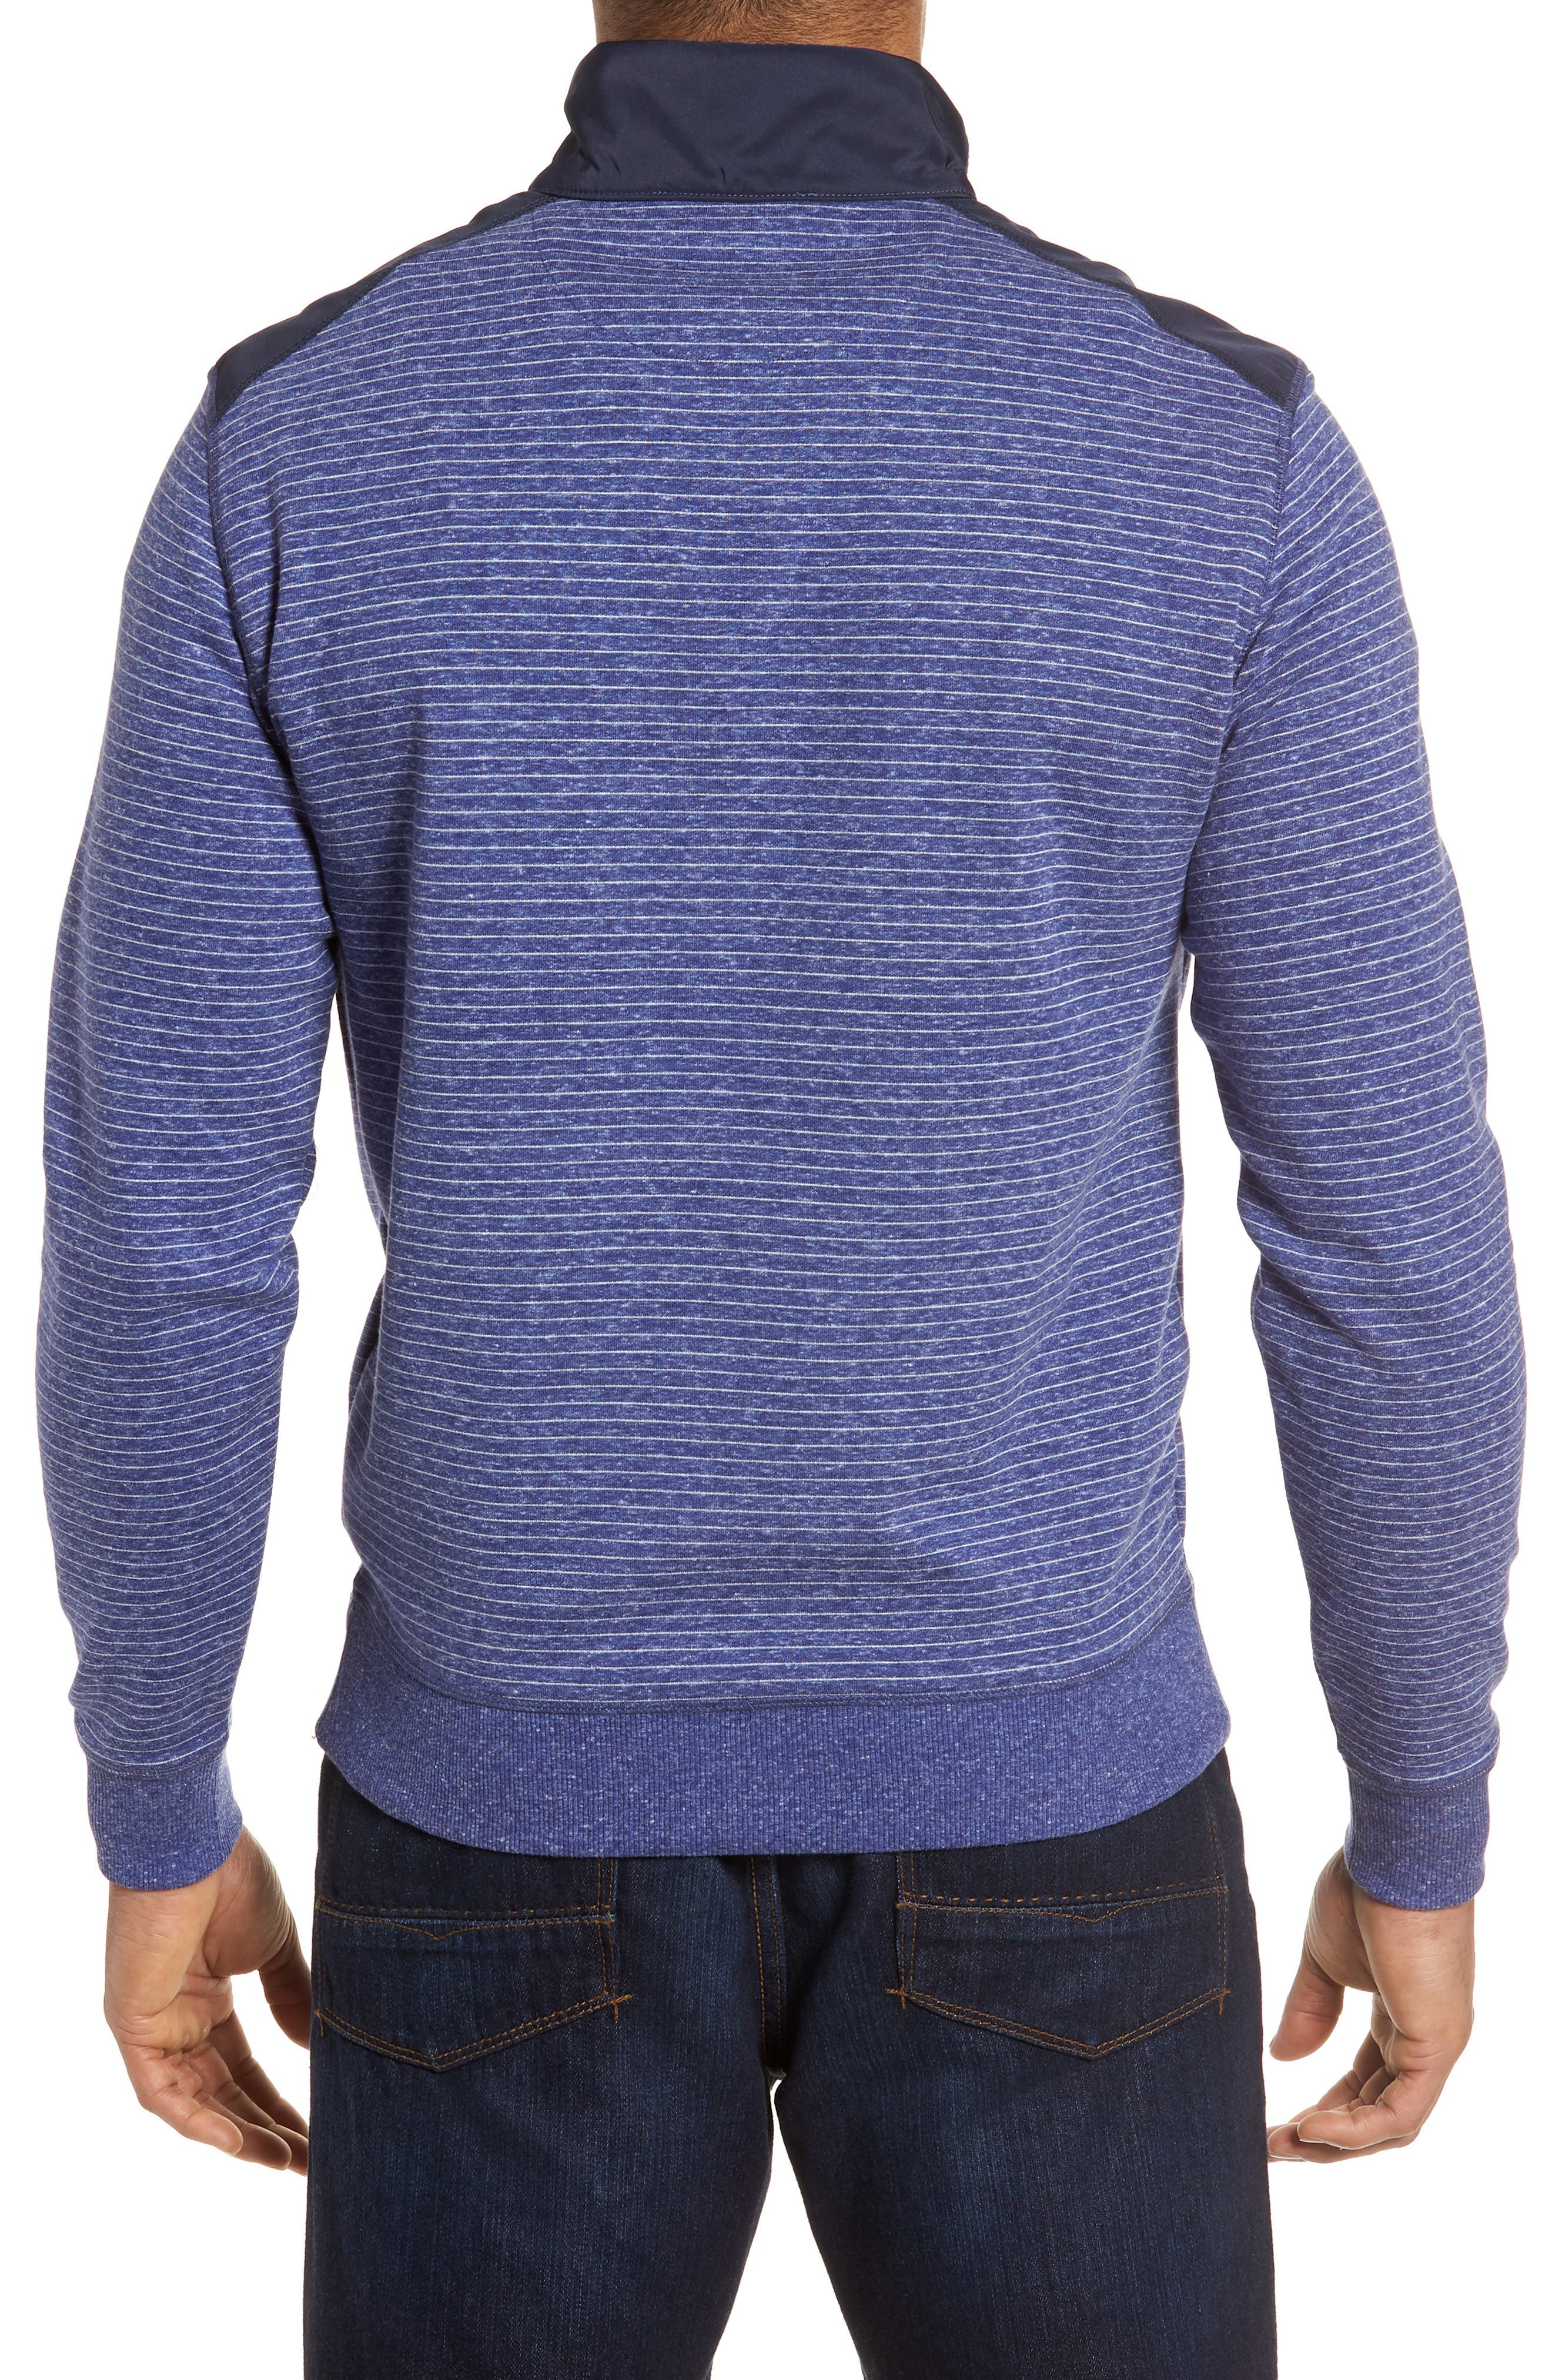 Regular Fit Stripe Quarter Zip Pullover,                             Alternate thumbnail 2, color,                             Night Blue